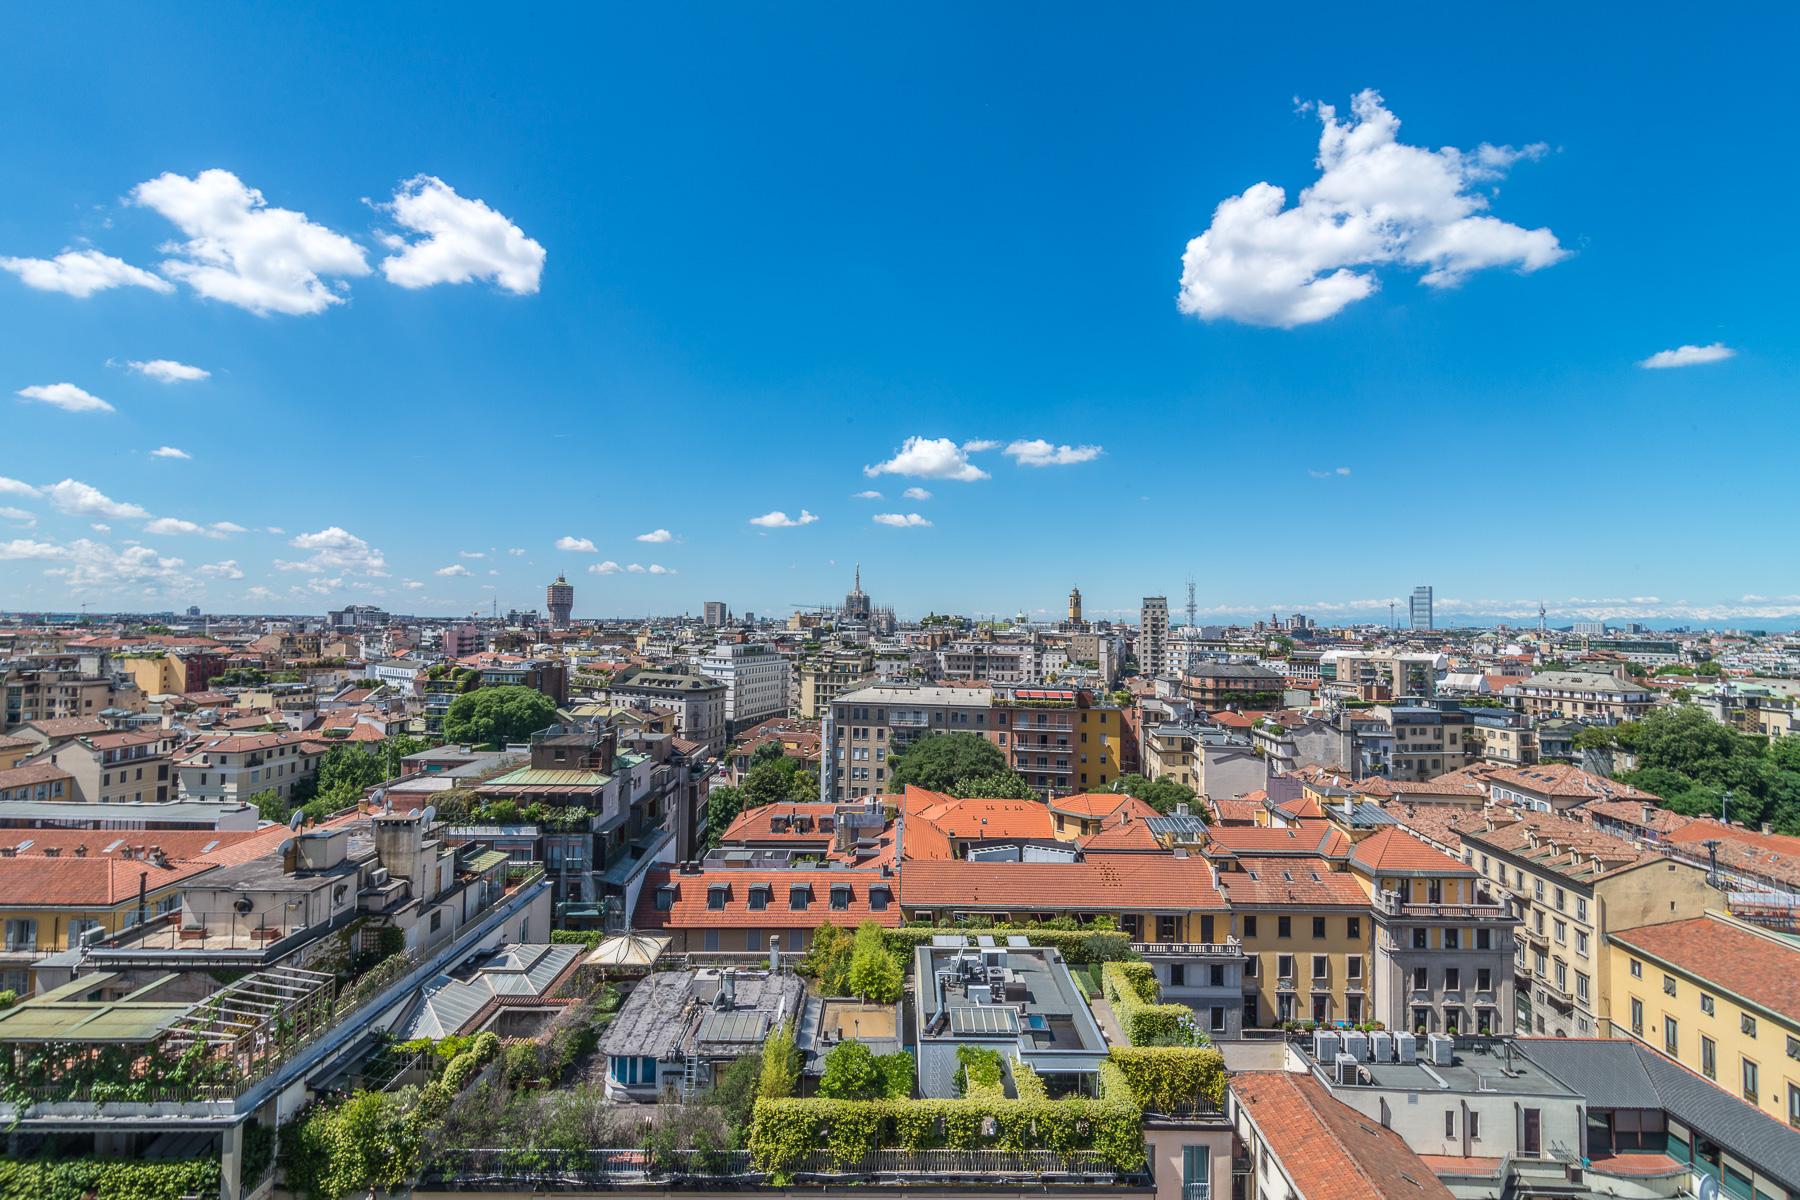 Imóvel para venda Milano